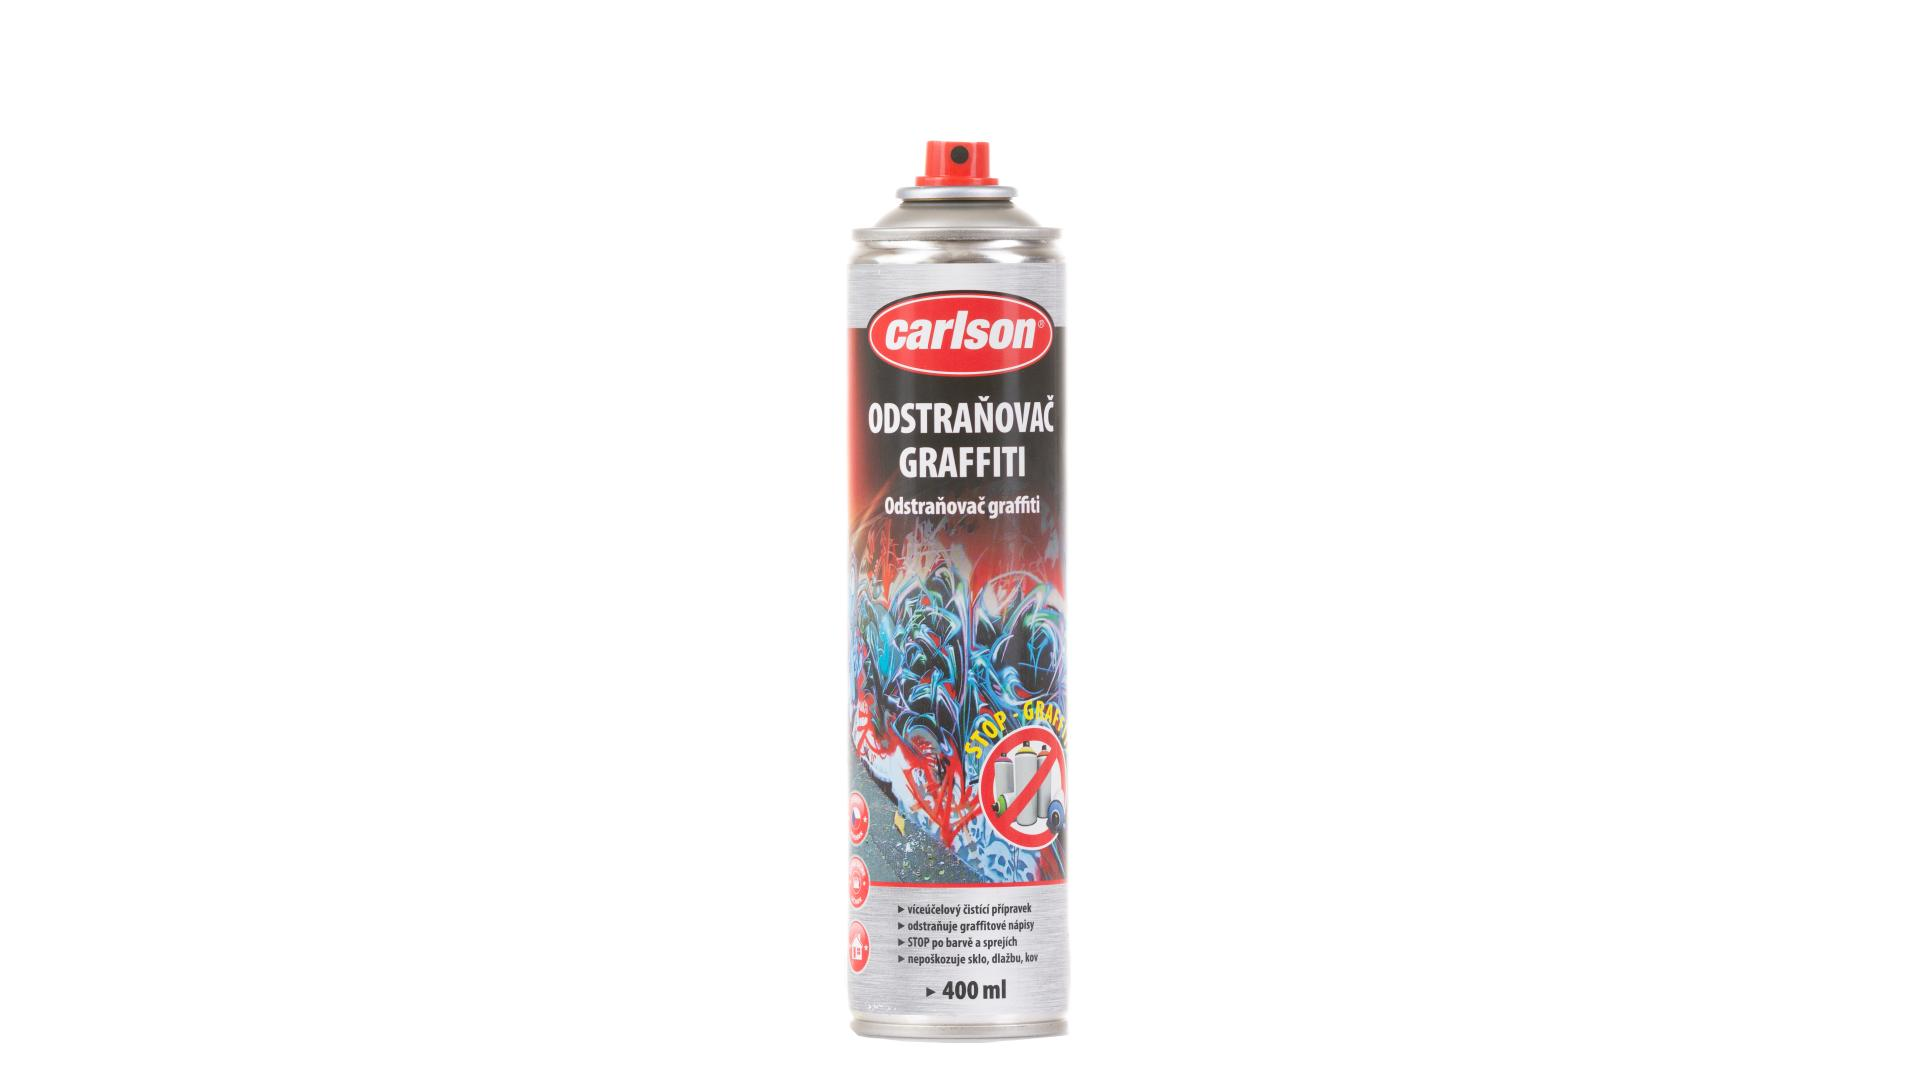 CARLSON odstraňovač graffiti 400 ml - aerosol